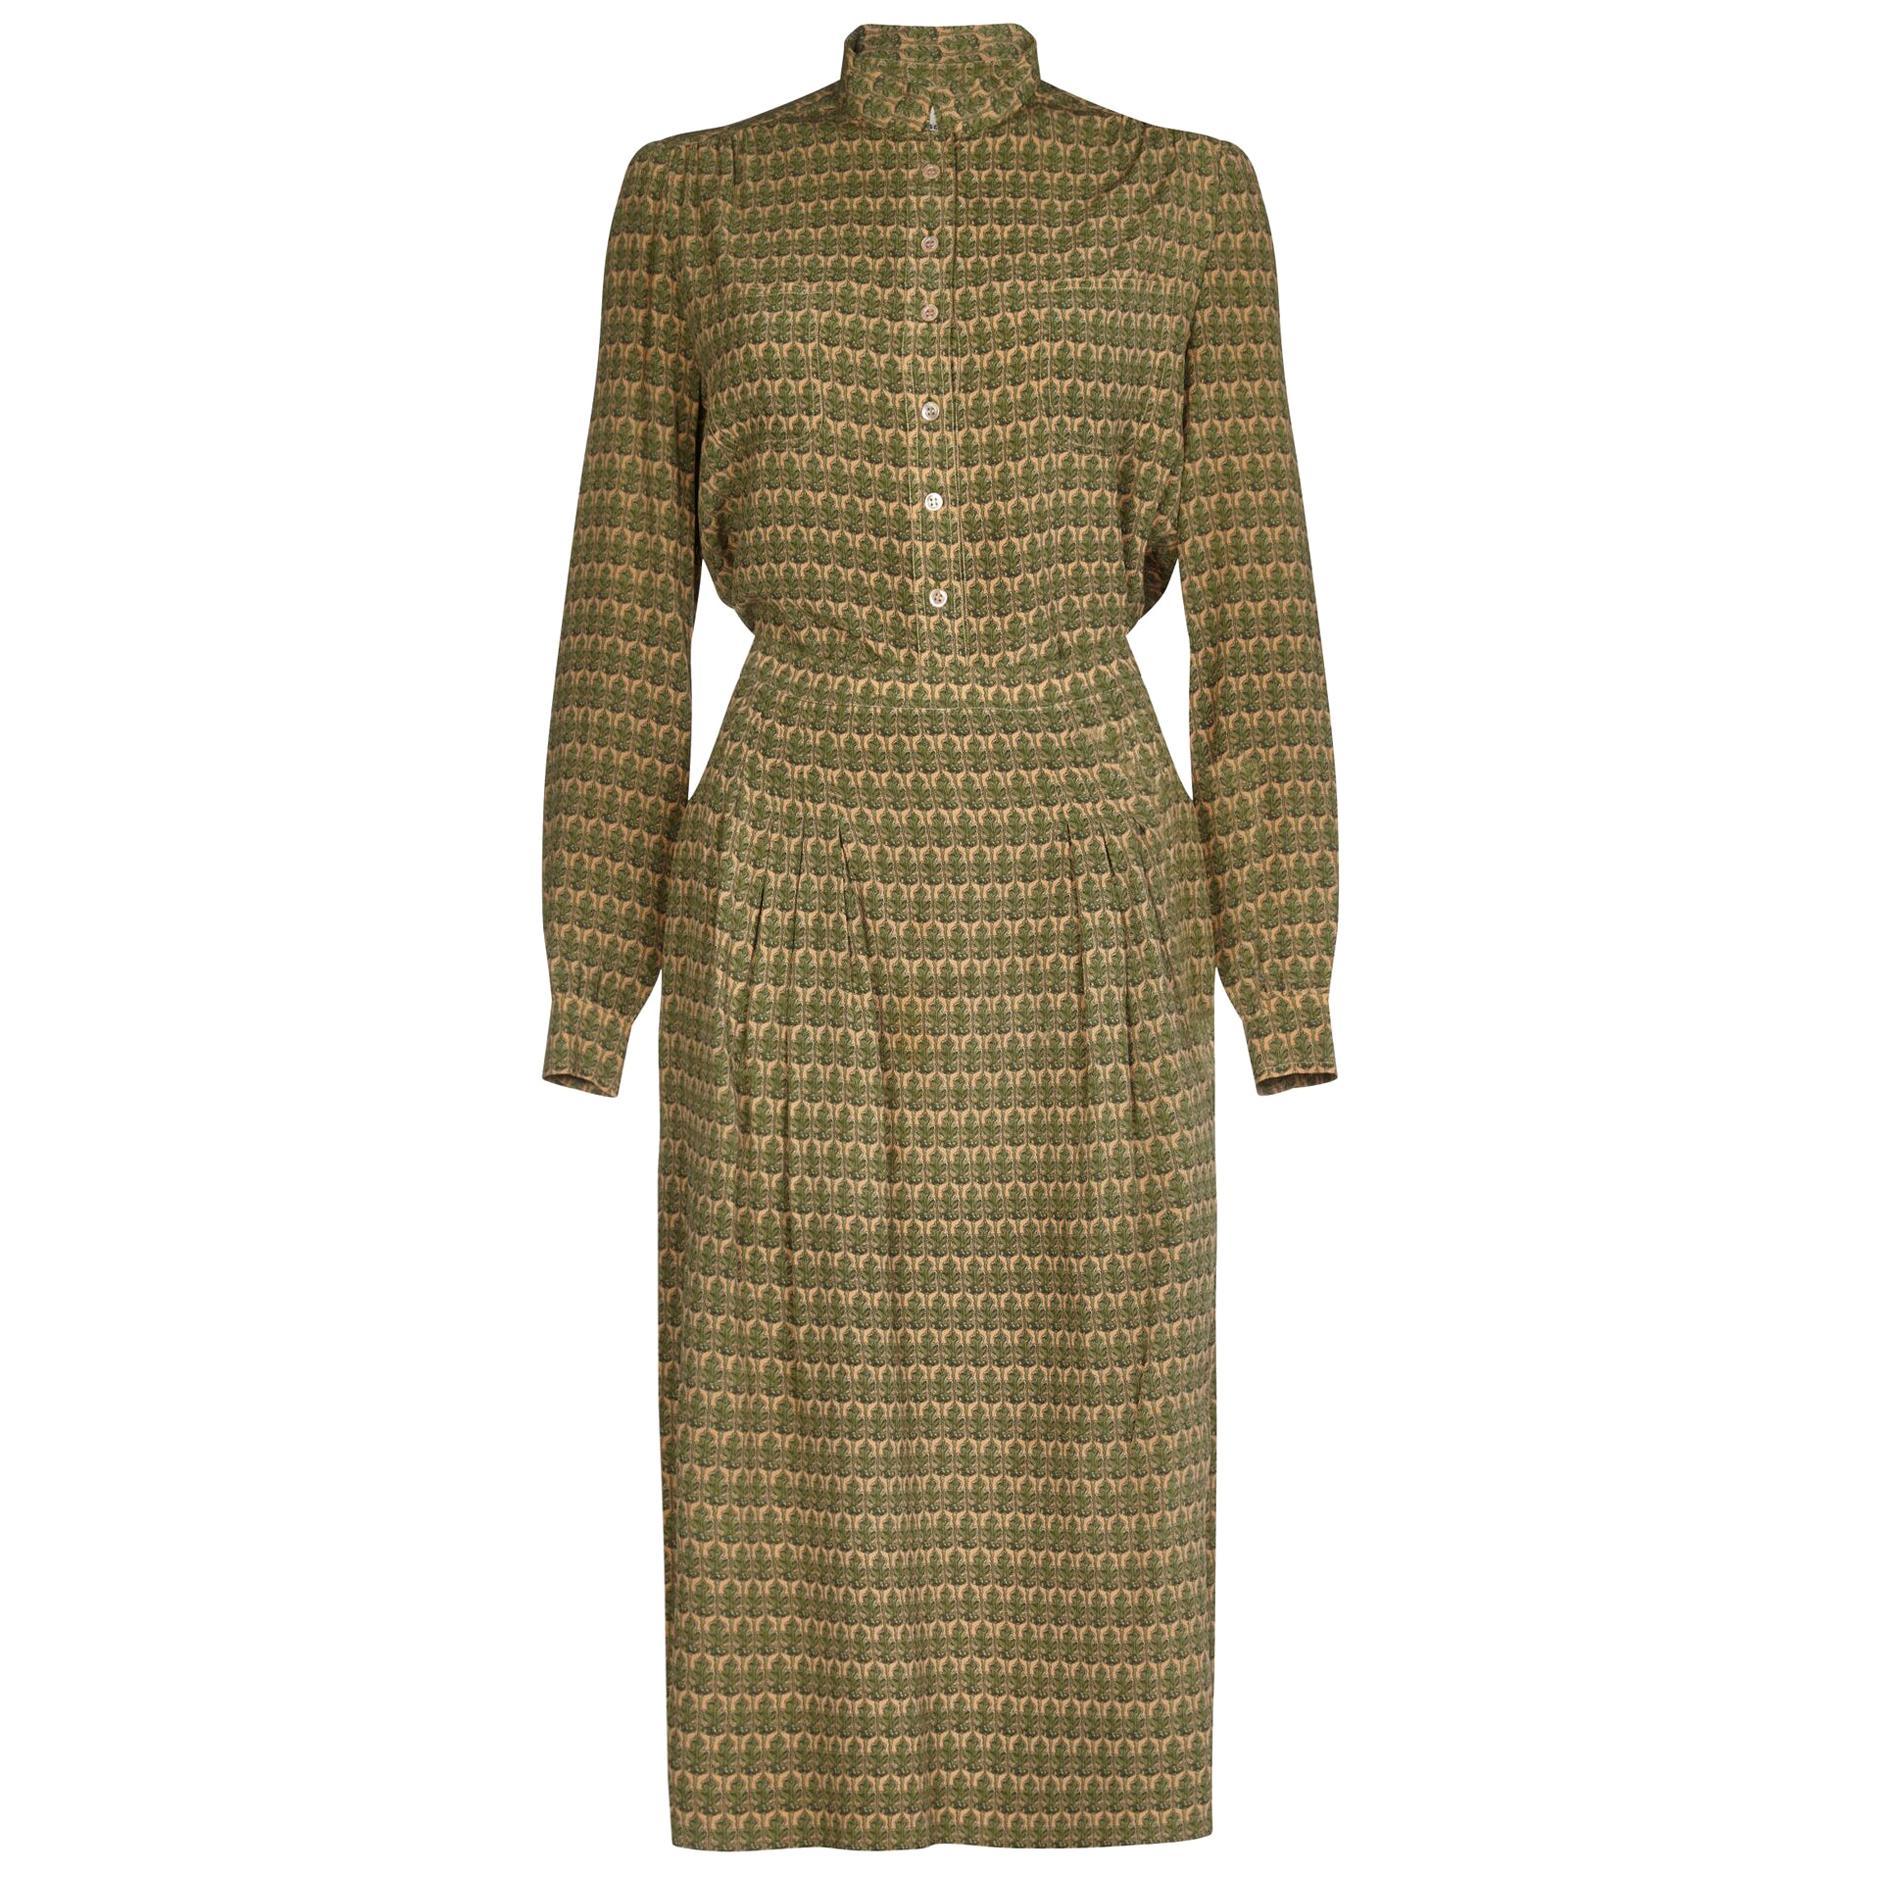 Hermes 1970s Silk Sage Green Oakleaf Print Blouse and Skirt Suit